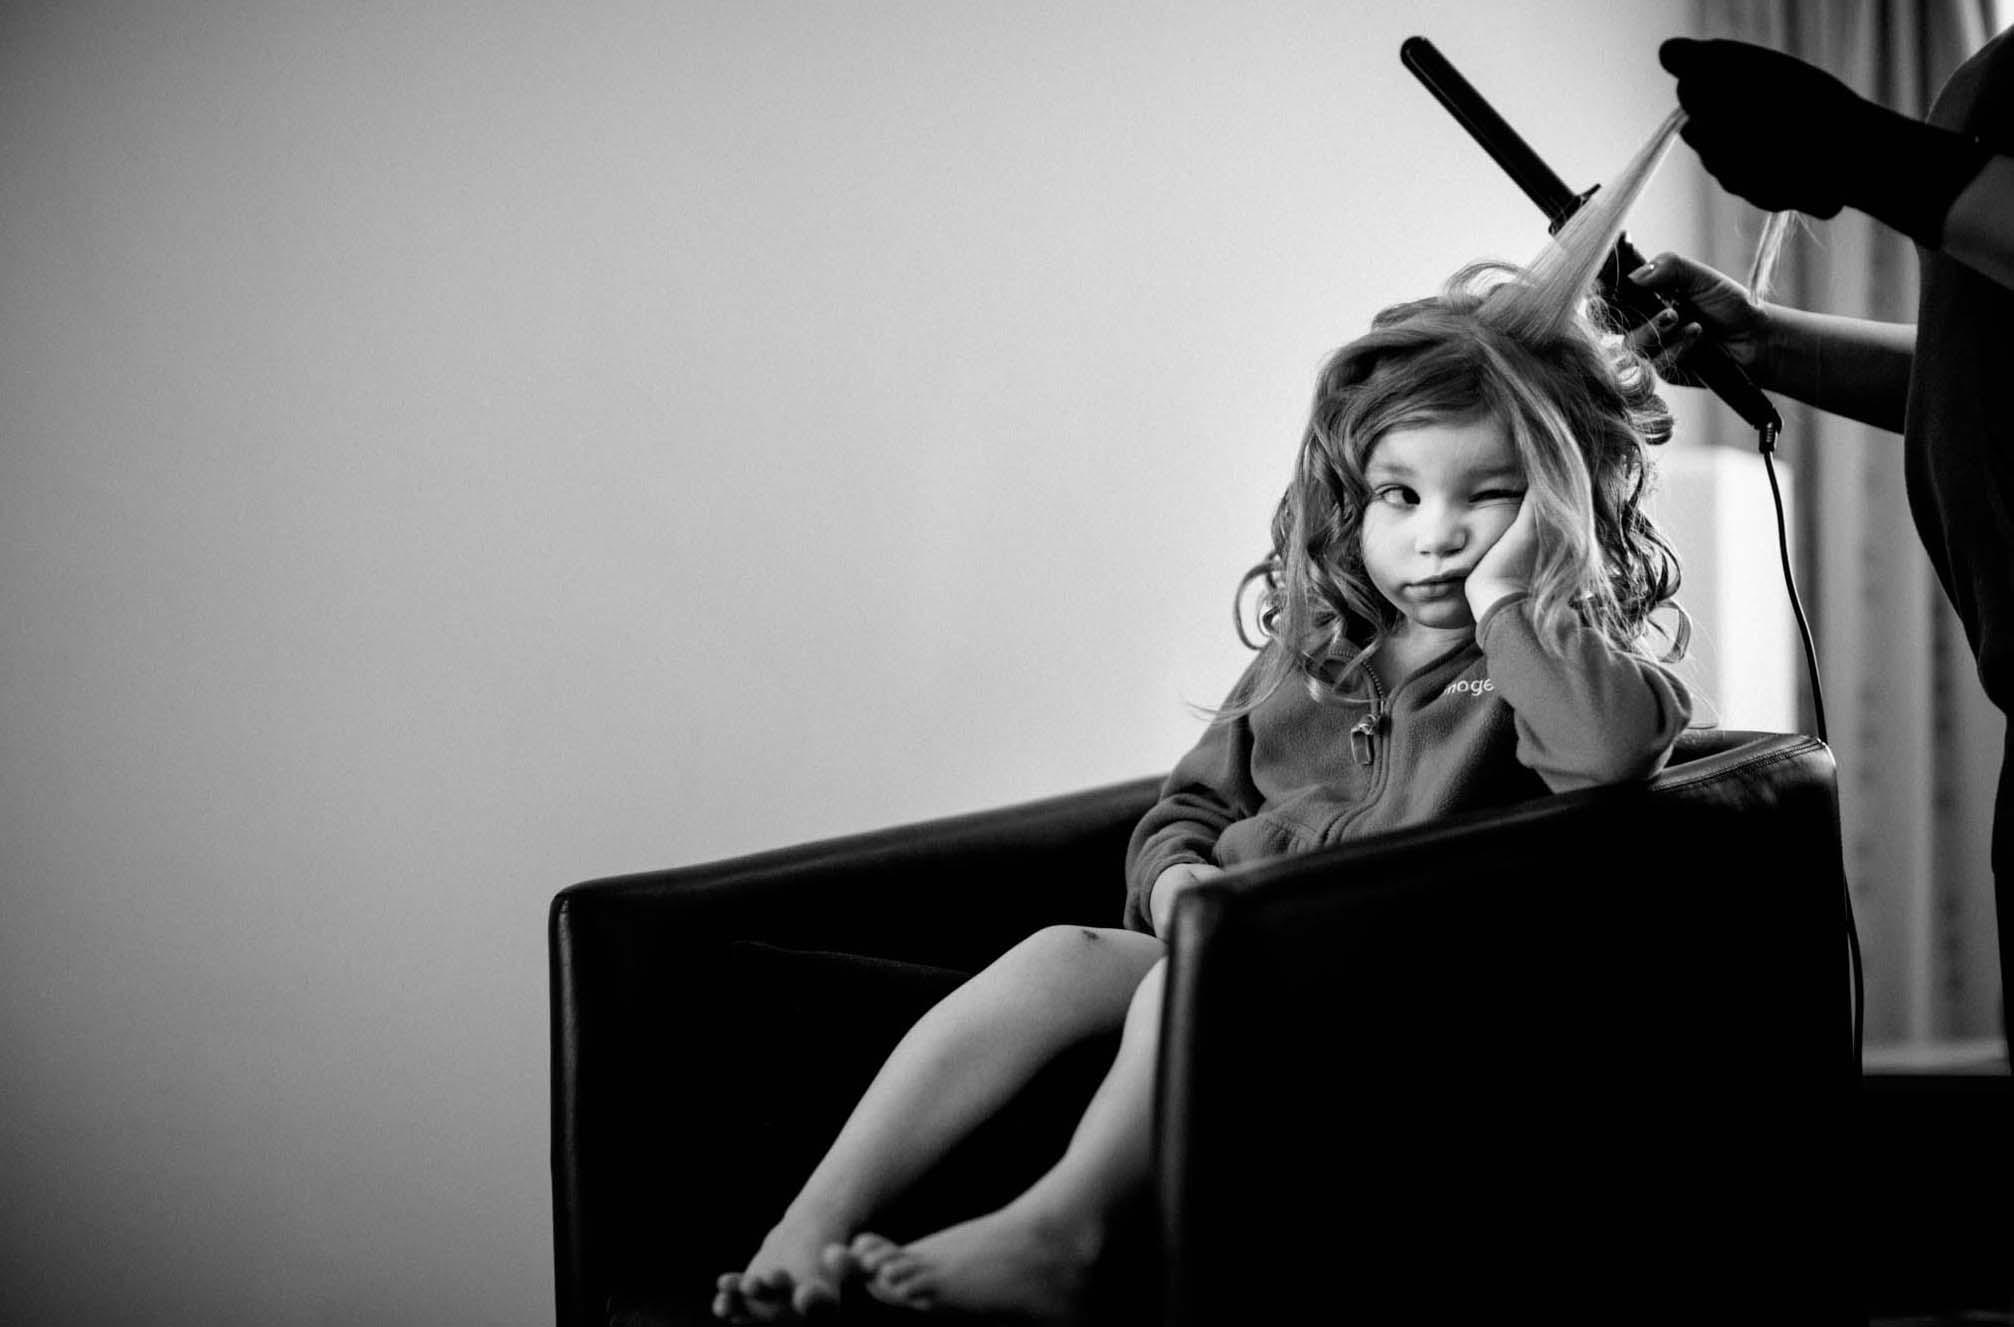 Ретро девушки салон, Девушки в ретро салон! - Досуг - Санкт-Петербург 7 фотография